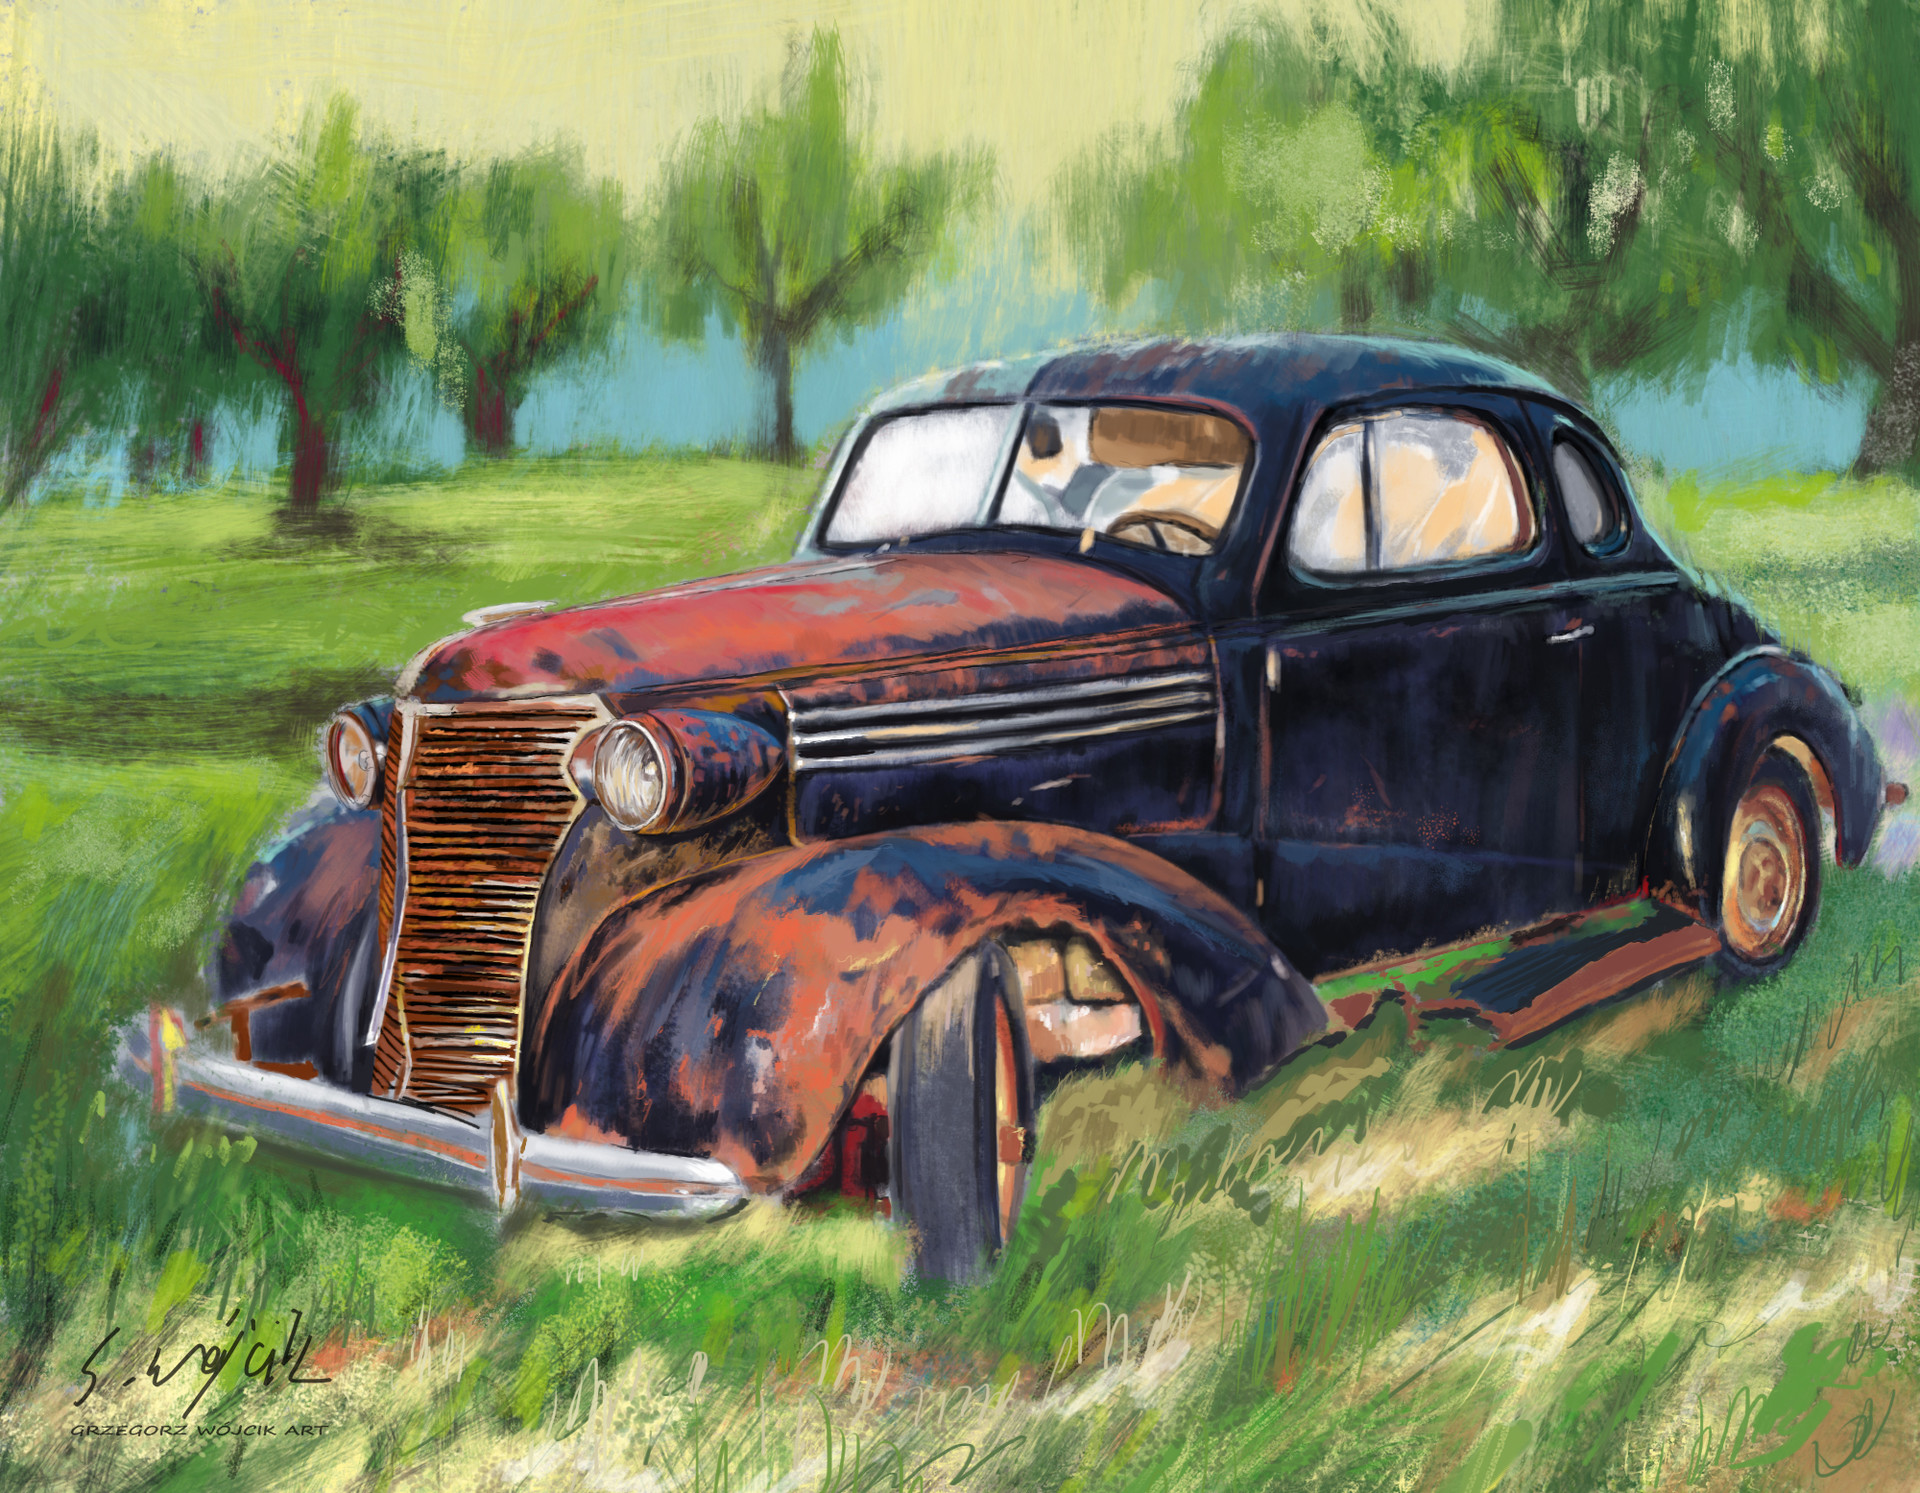 Pic Of Old Cars >> ArtStation - Old Rusty Car , Grzegorz Wójcik